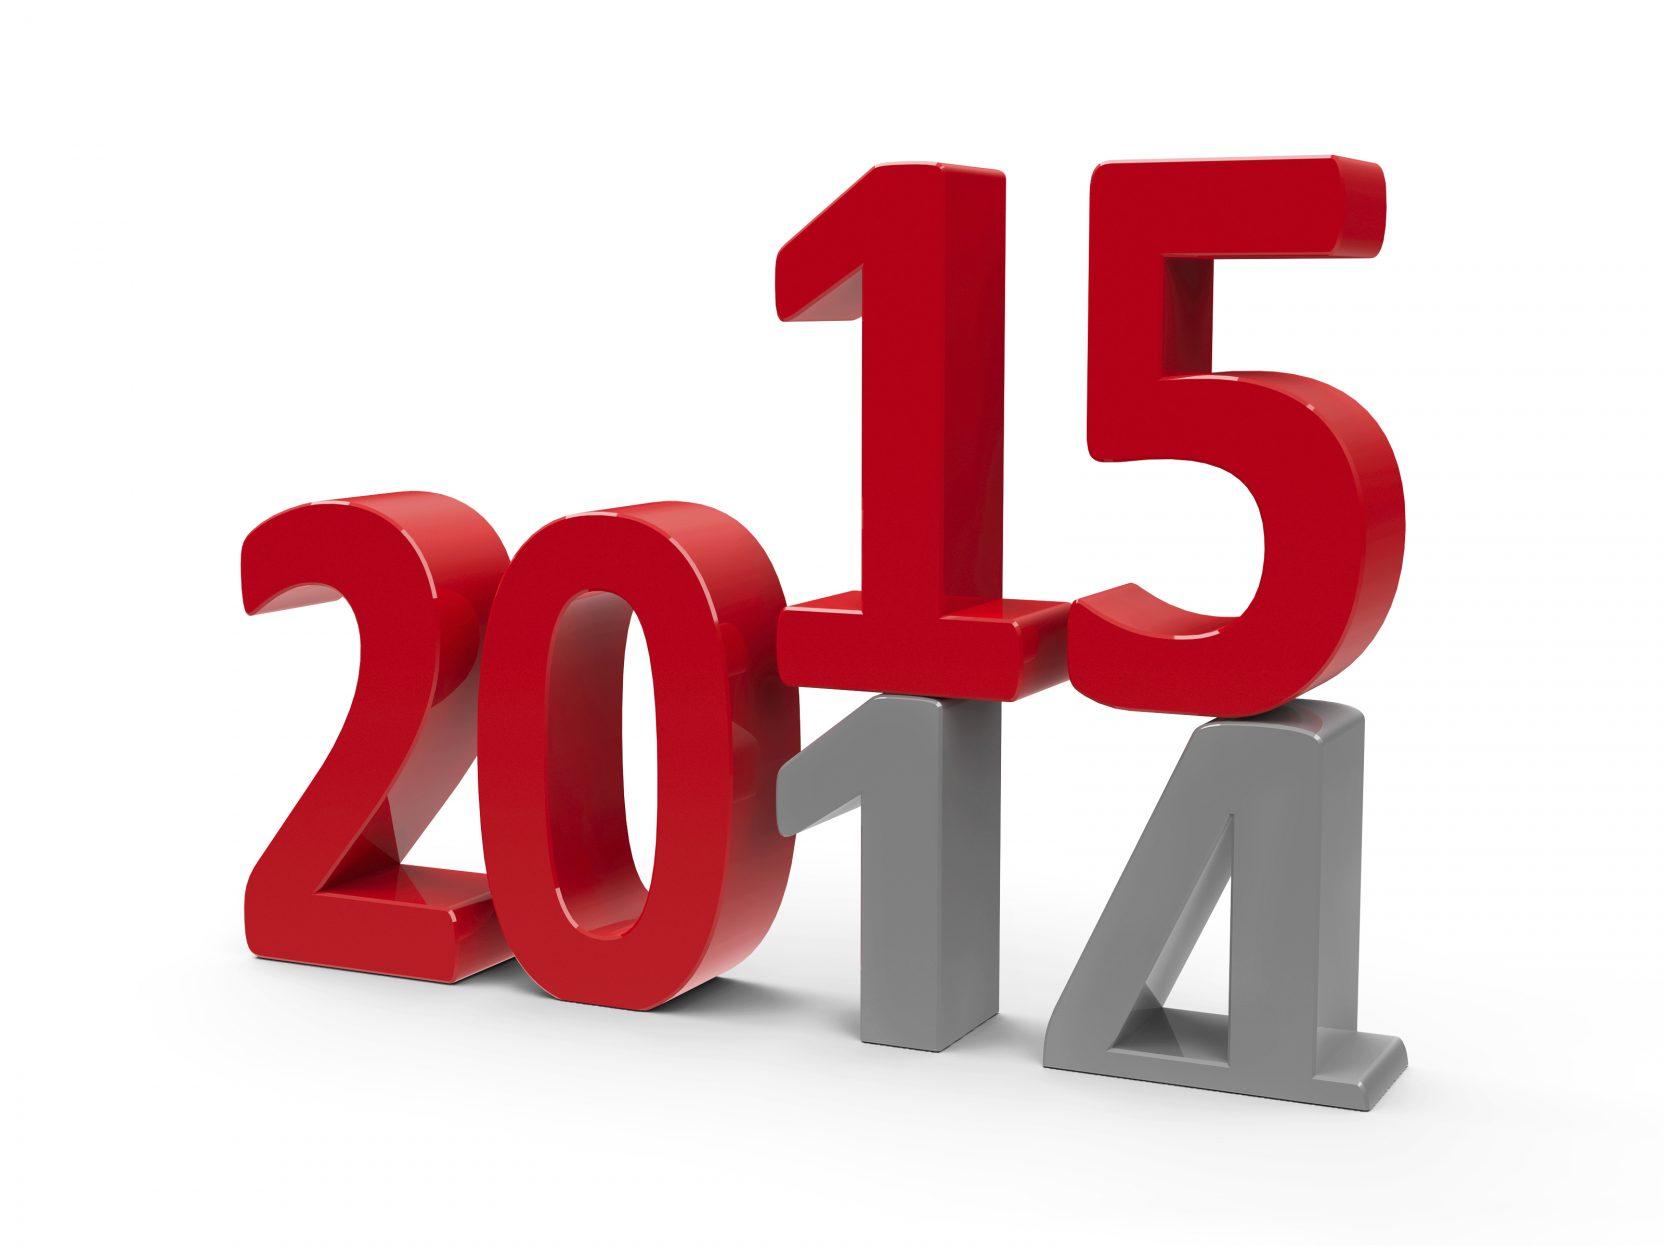 Status for 2014